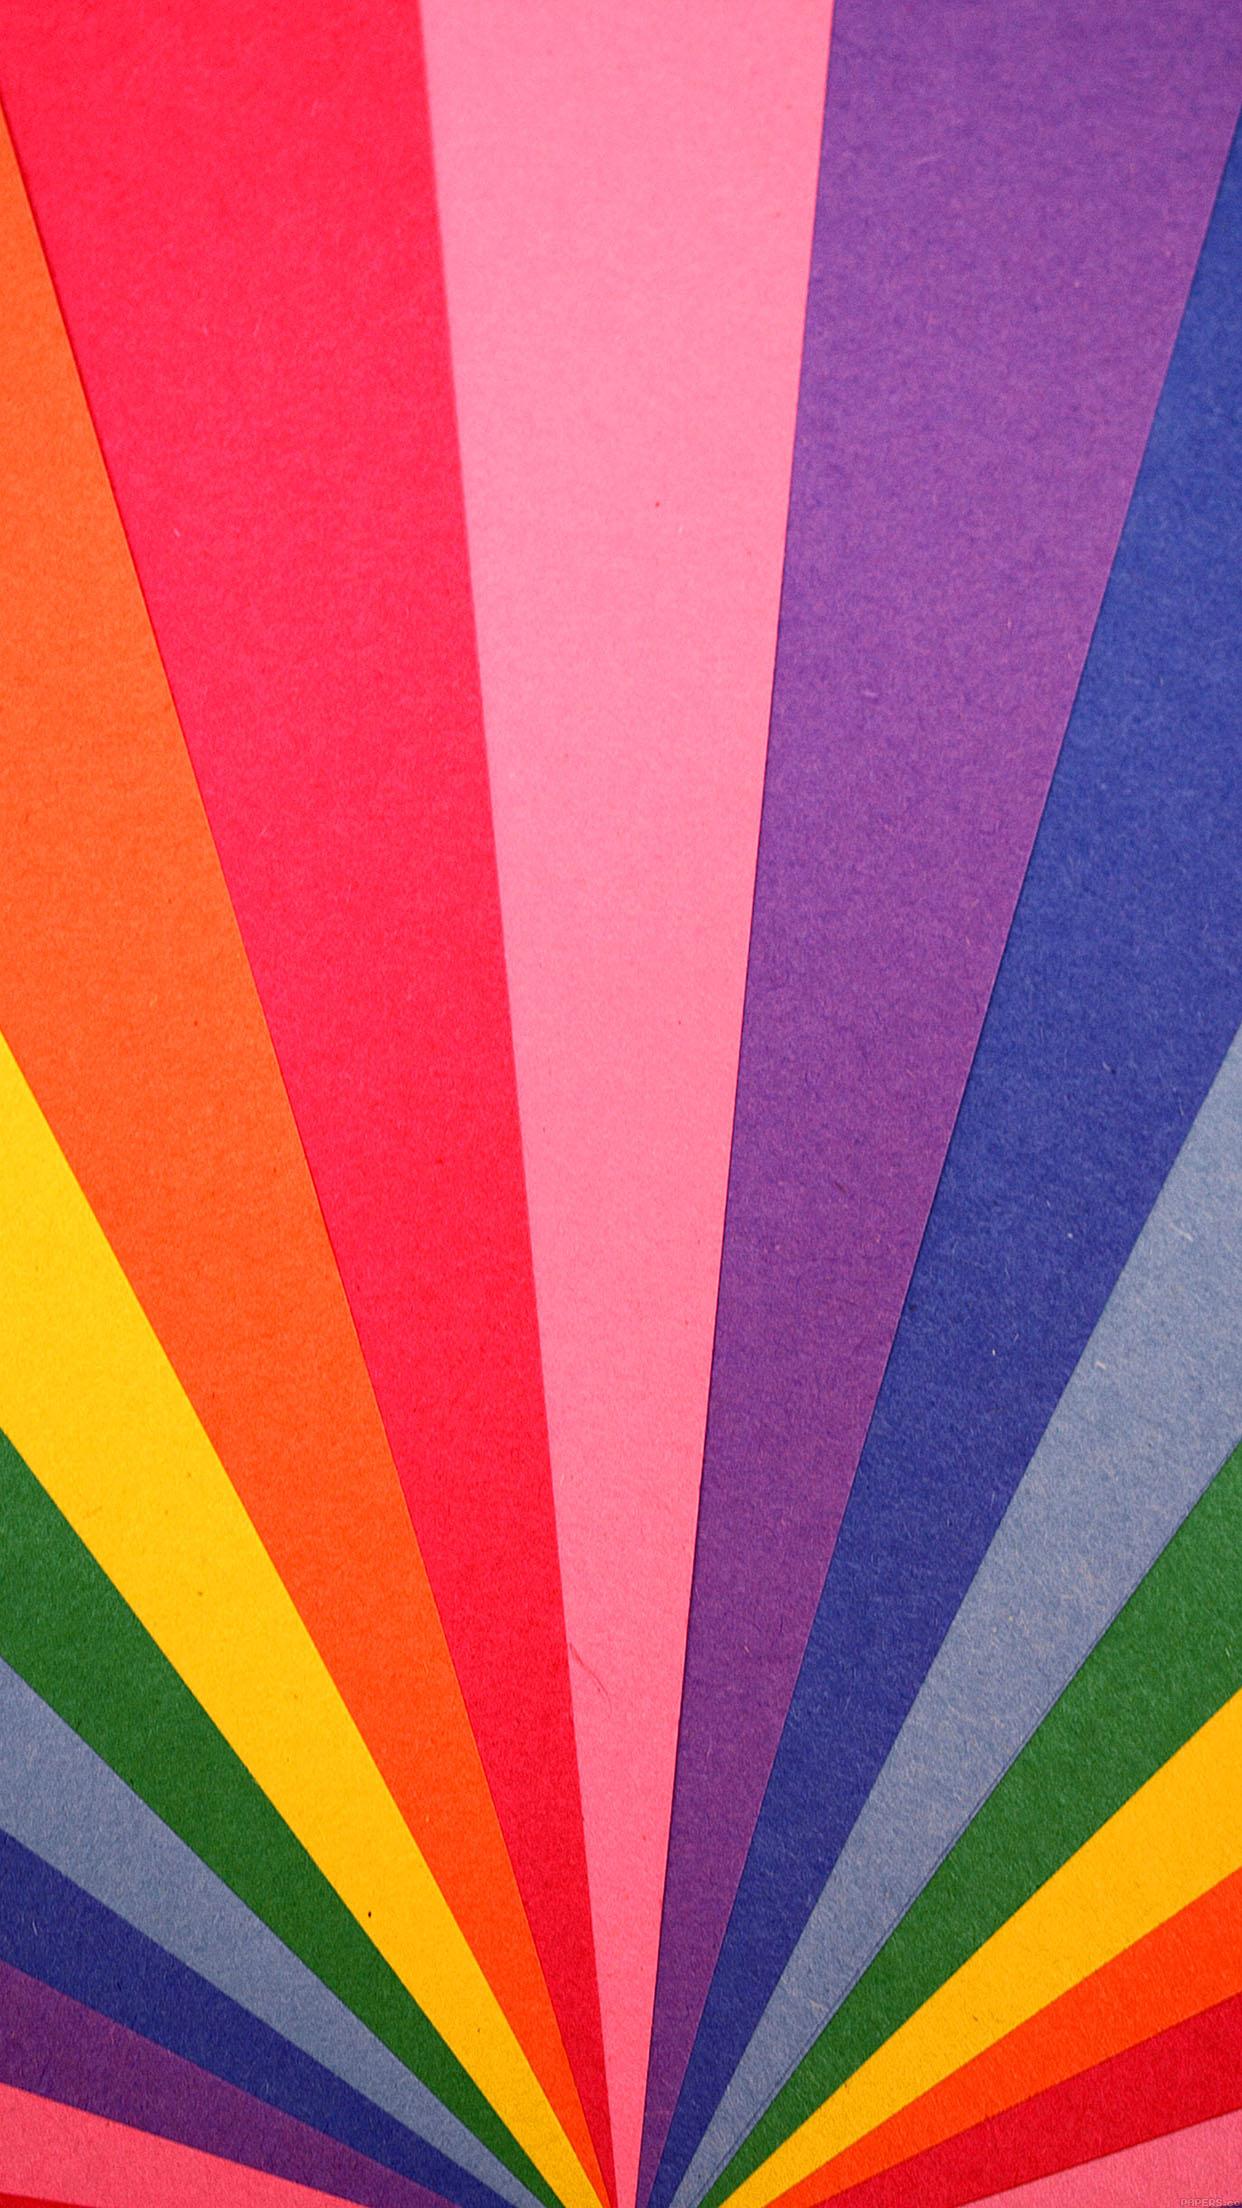 va31-rainbow-light-pattern - Papers.co